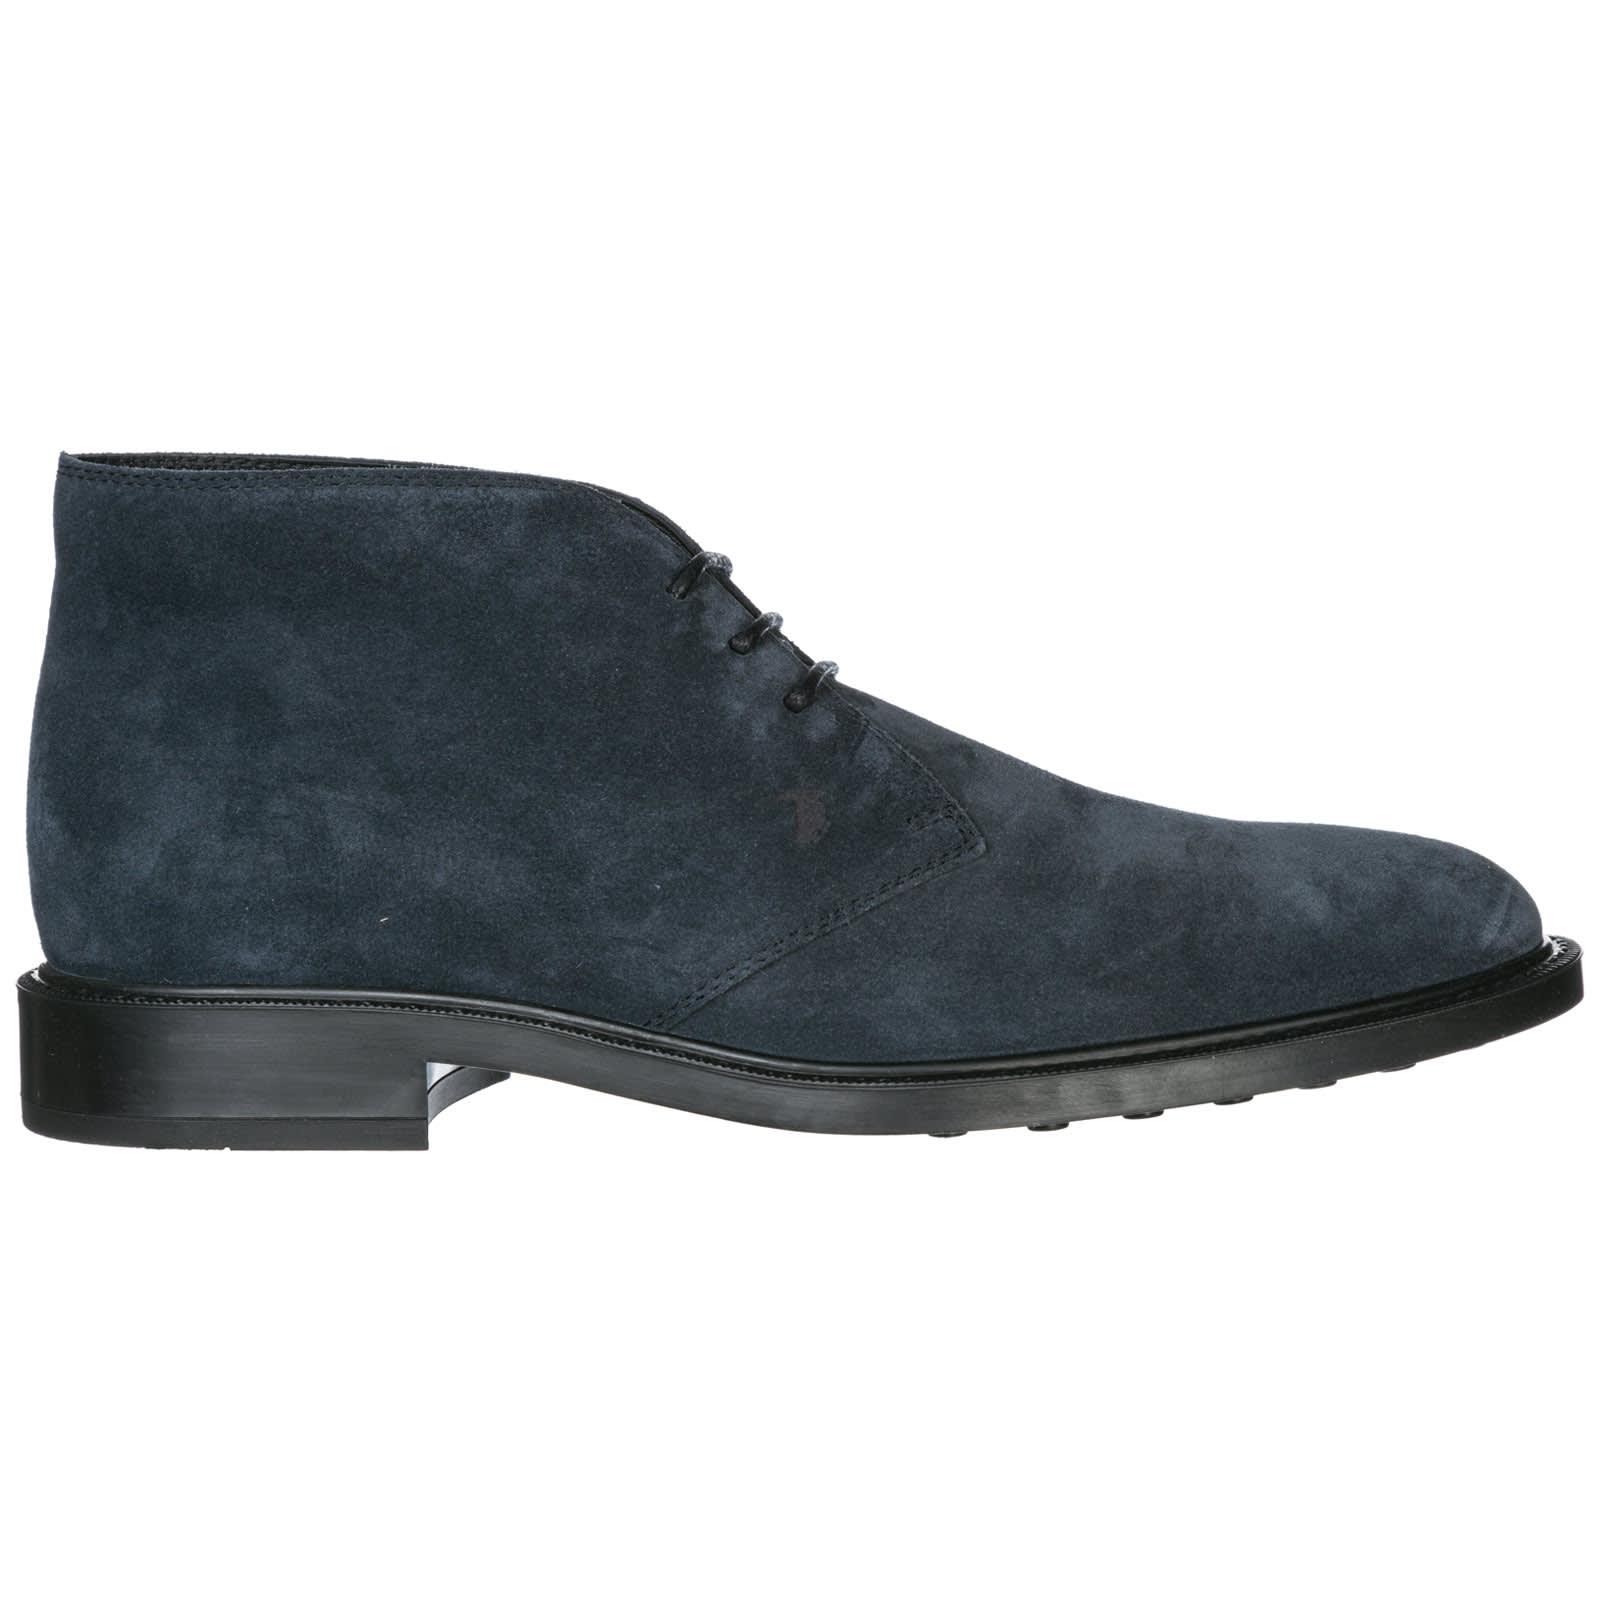 Tods Newark Desert Boots